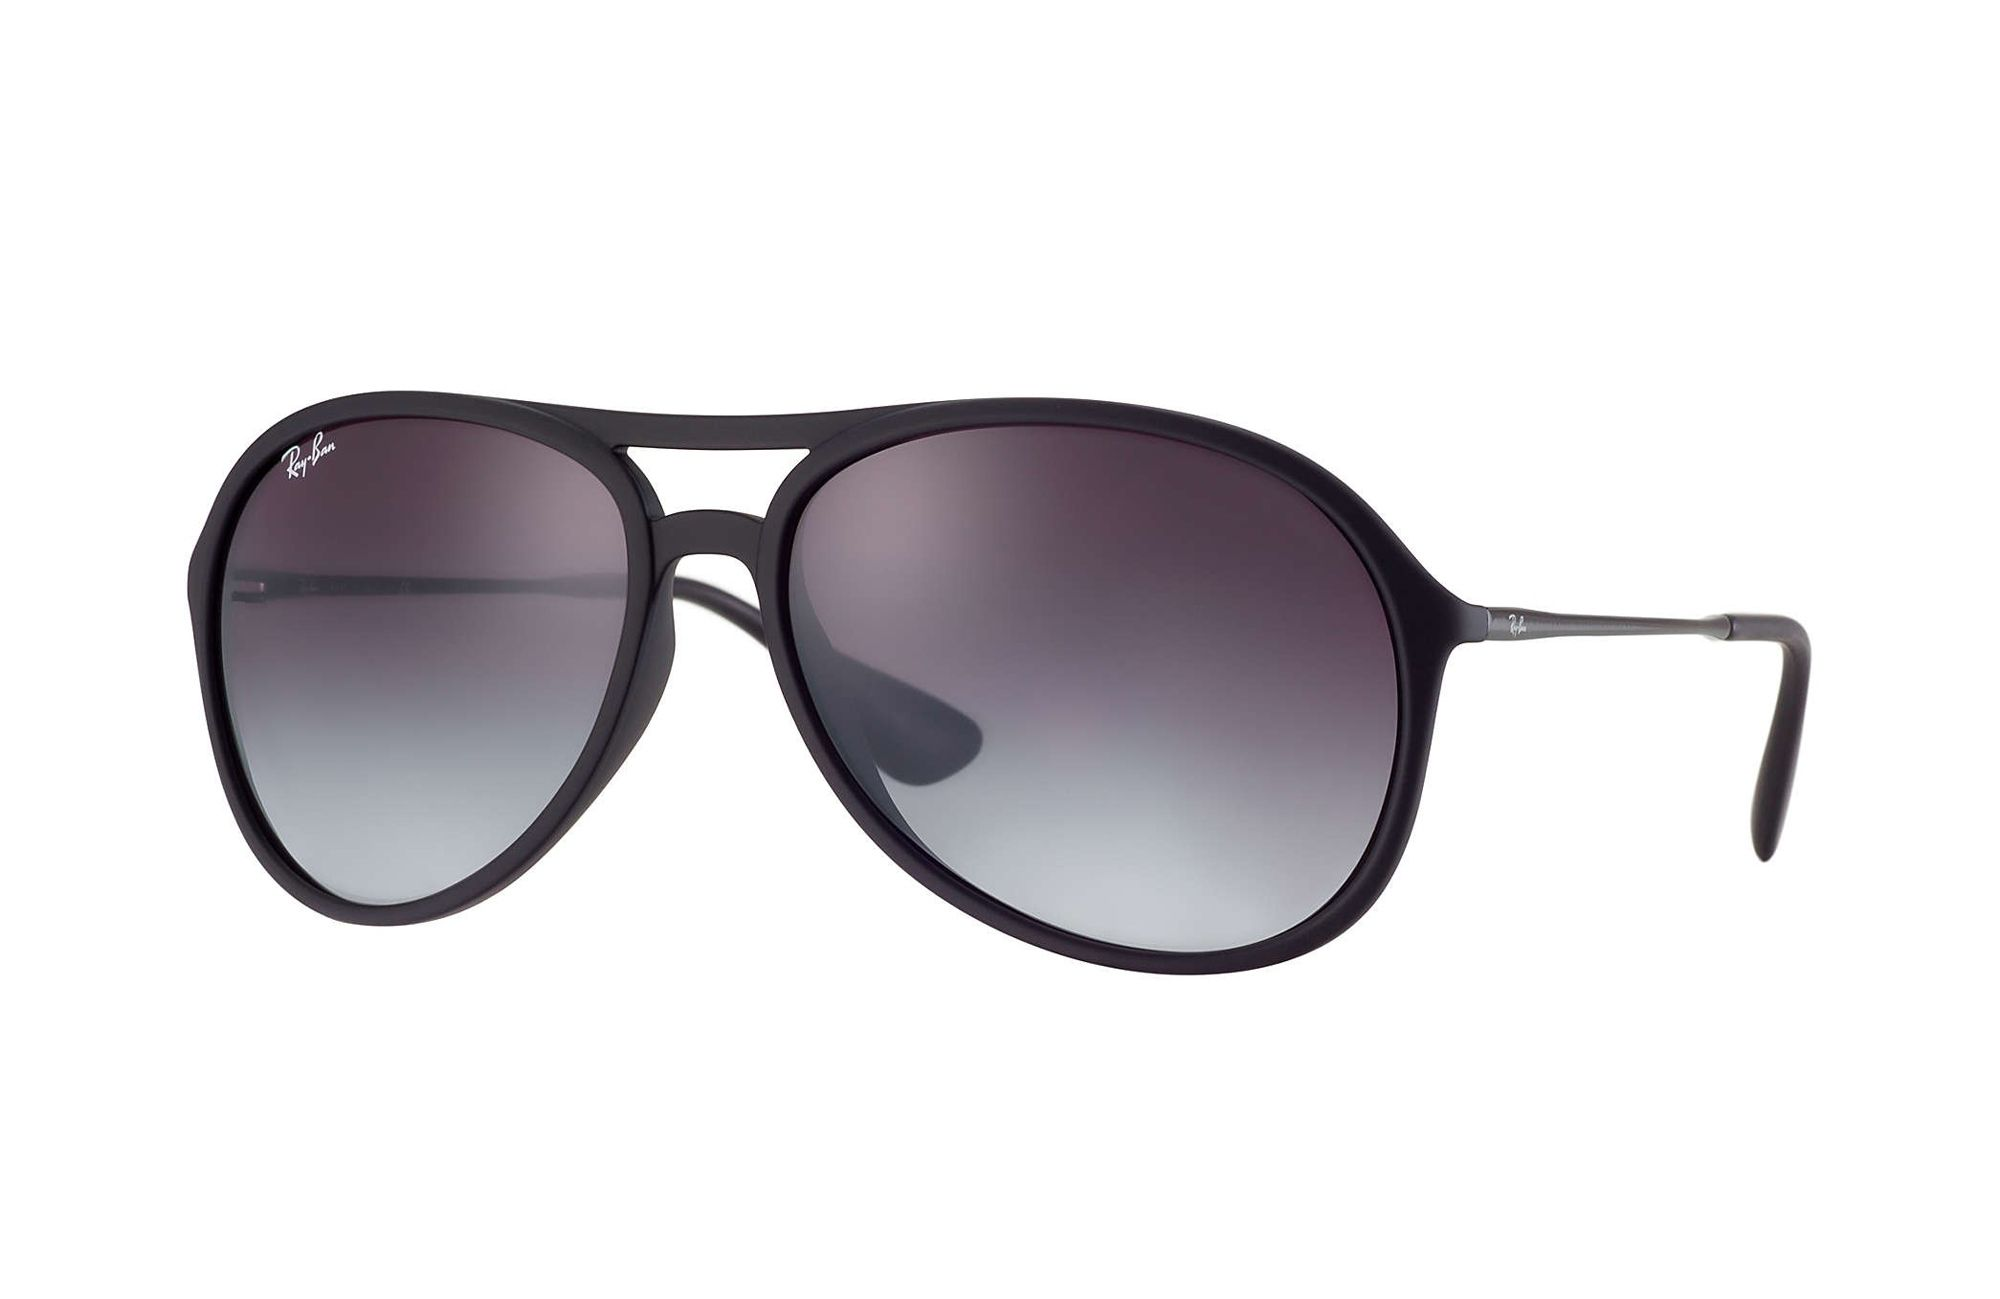 c26c7dca1 سعر Ray-Ban Ray-Ban Sunglasses فى مصر | جوميا | نظارات | كان بكام